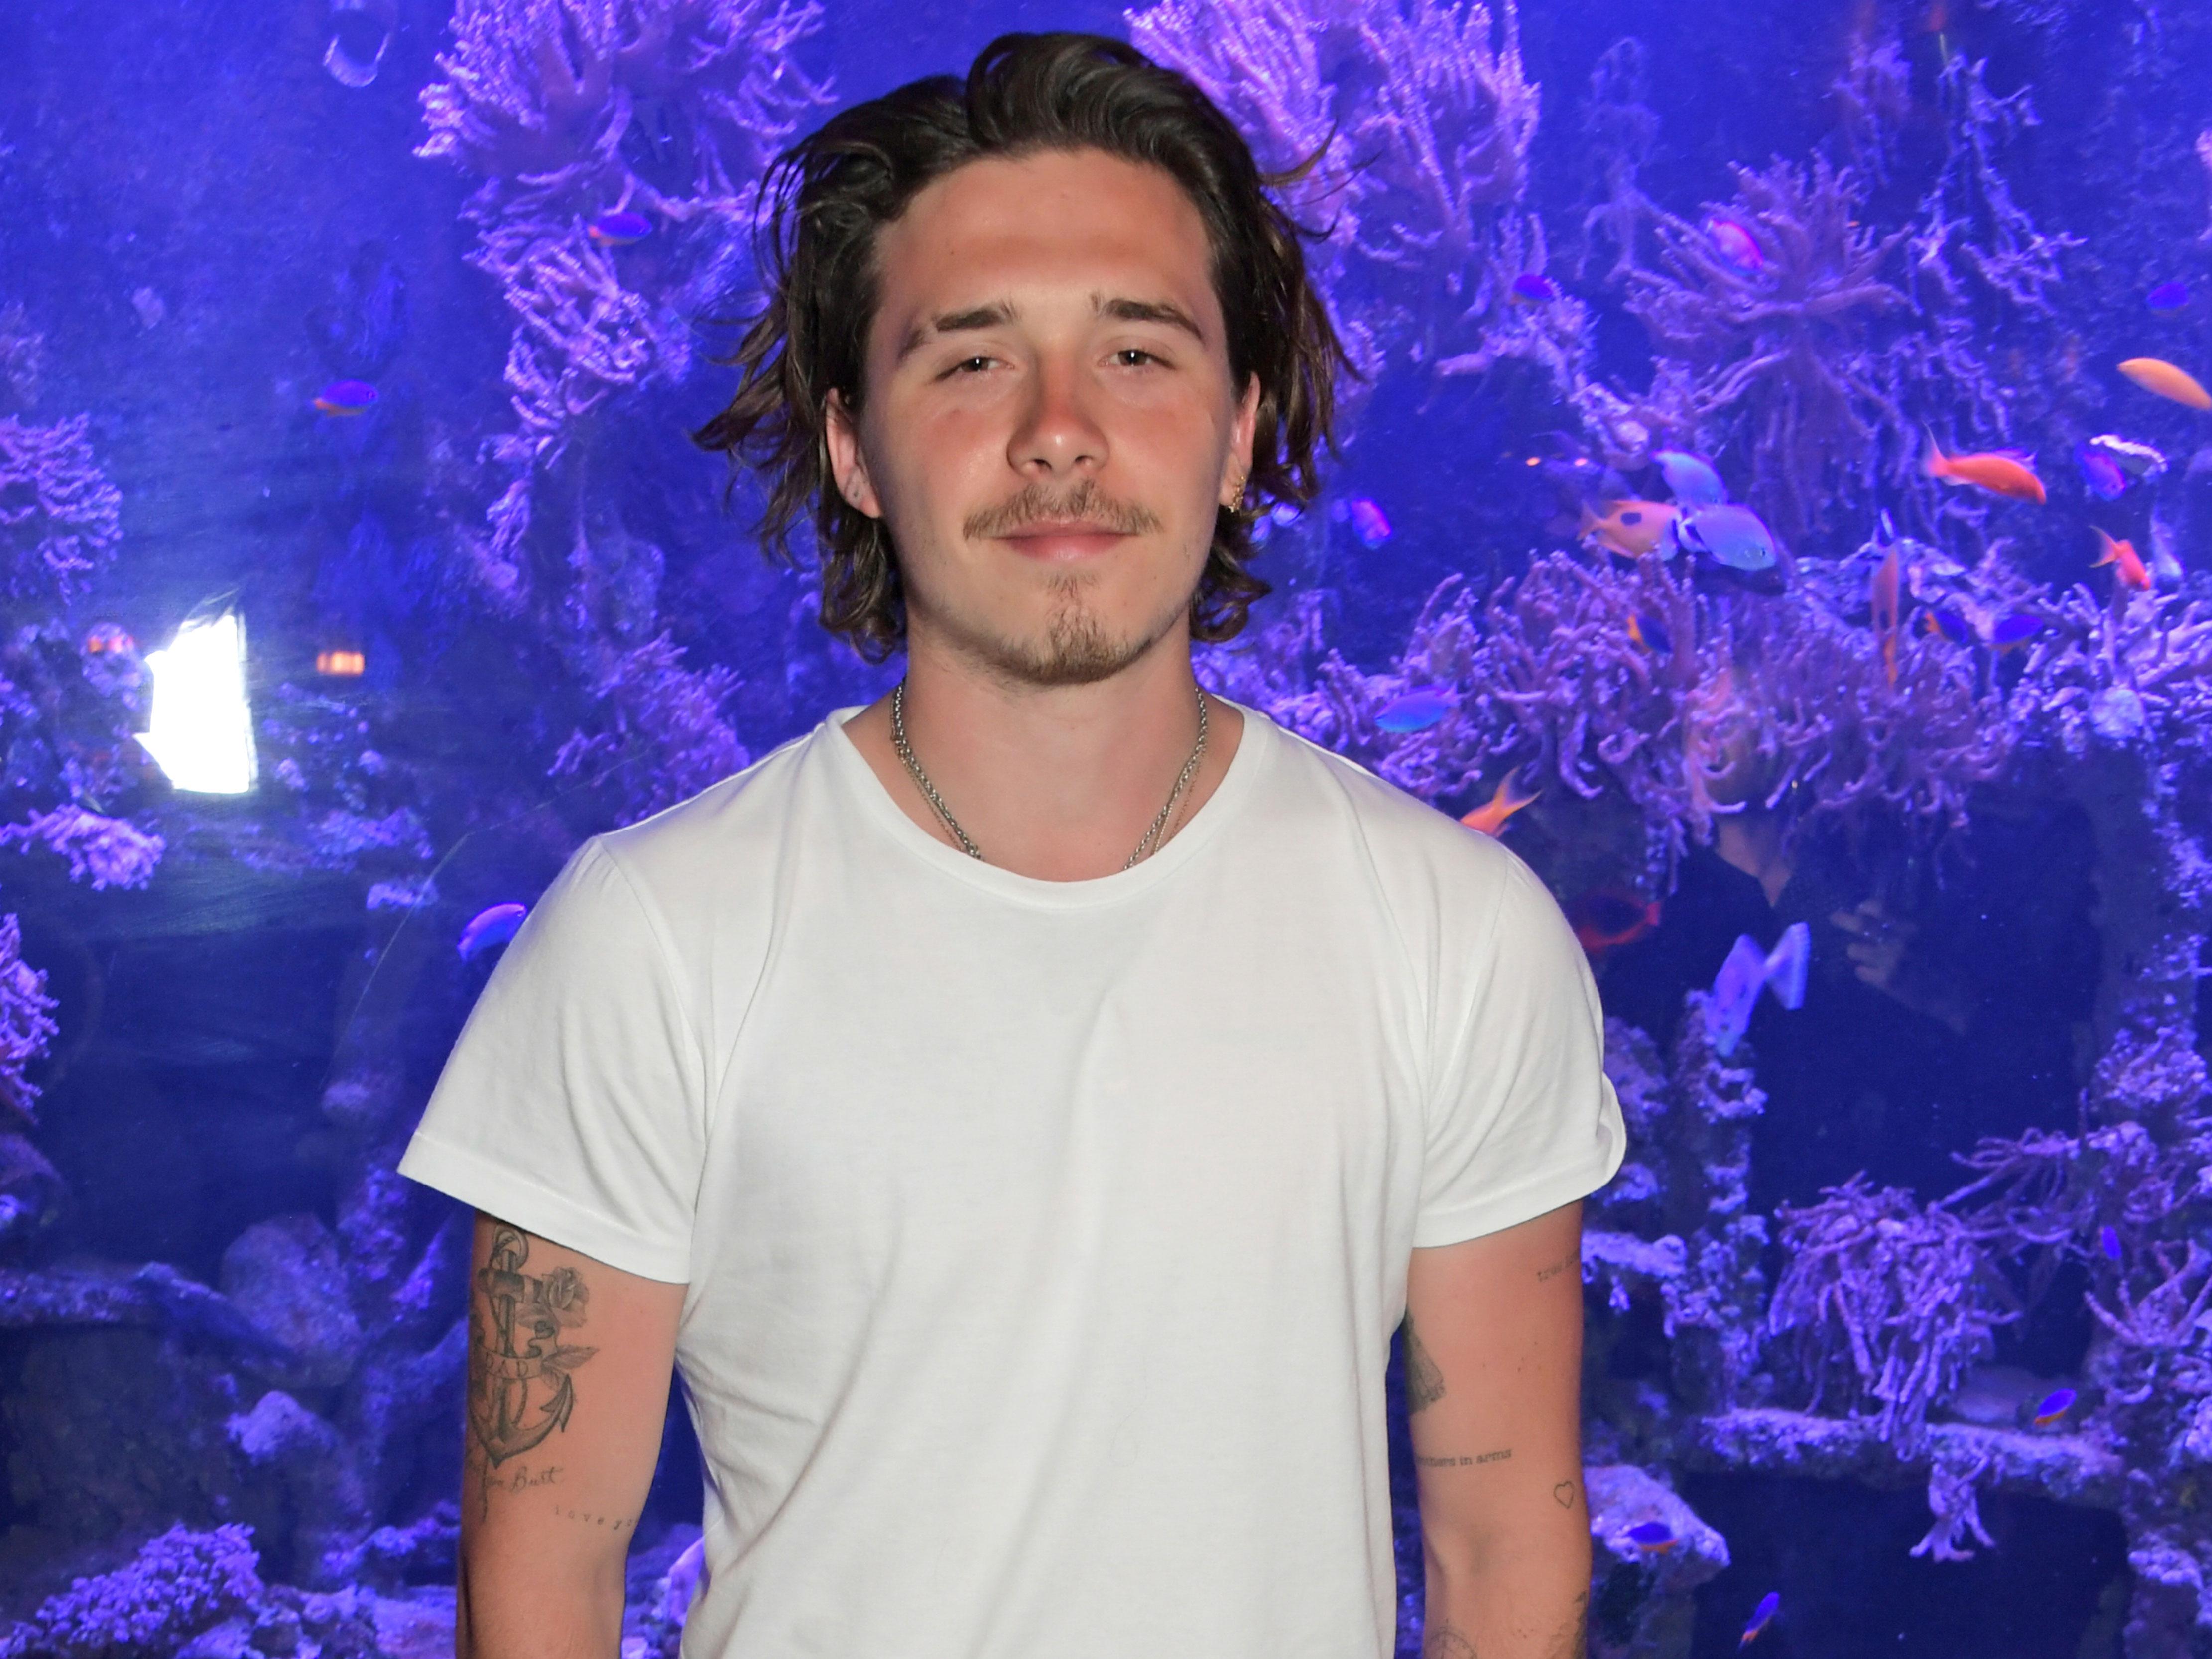 Brooklyn Beckham is 'lacking basic skills' as famous photographer Rankin's intern 2